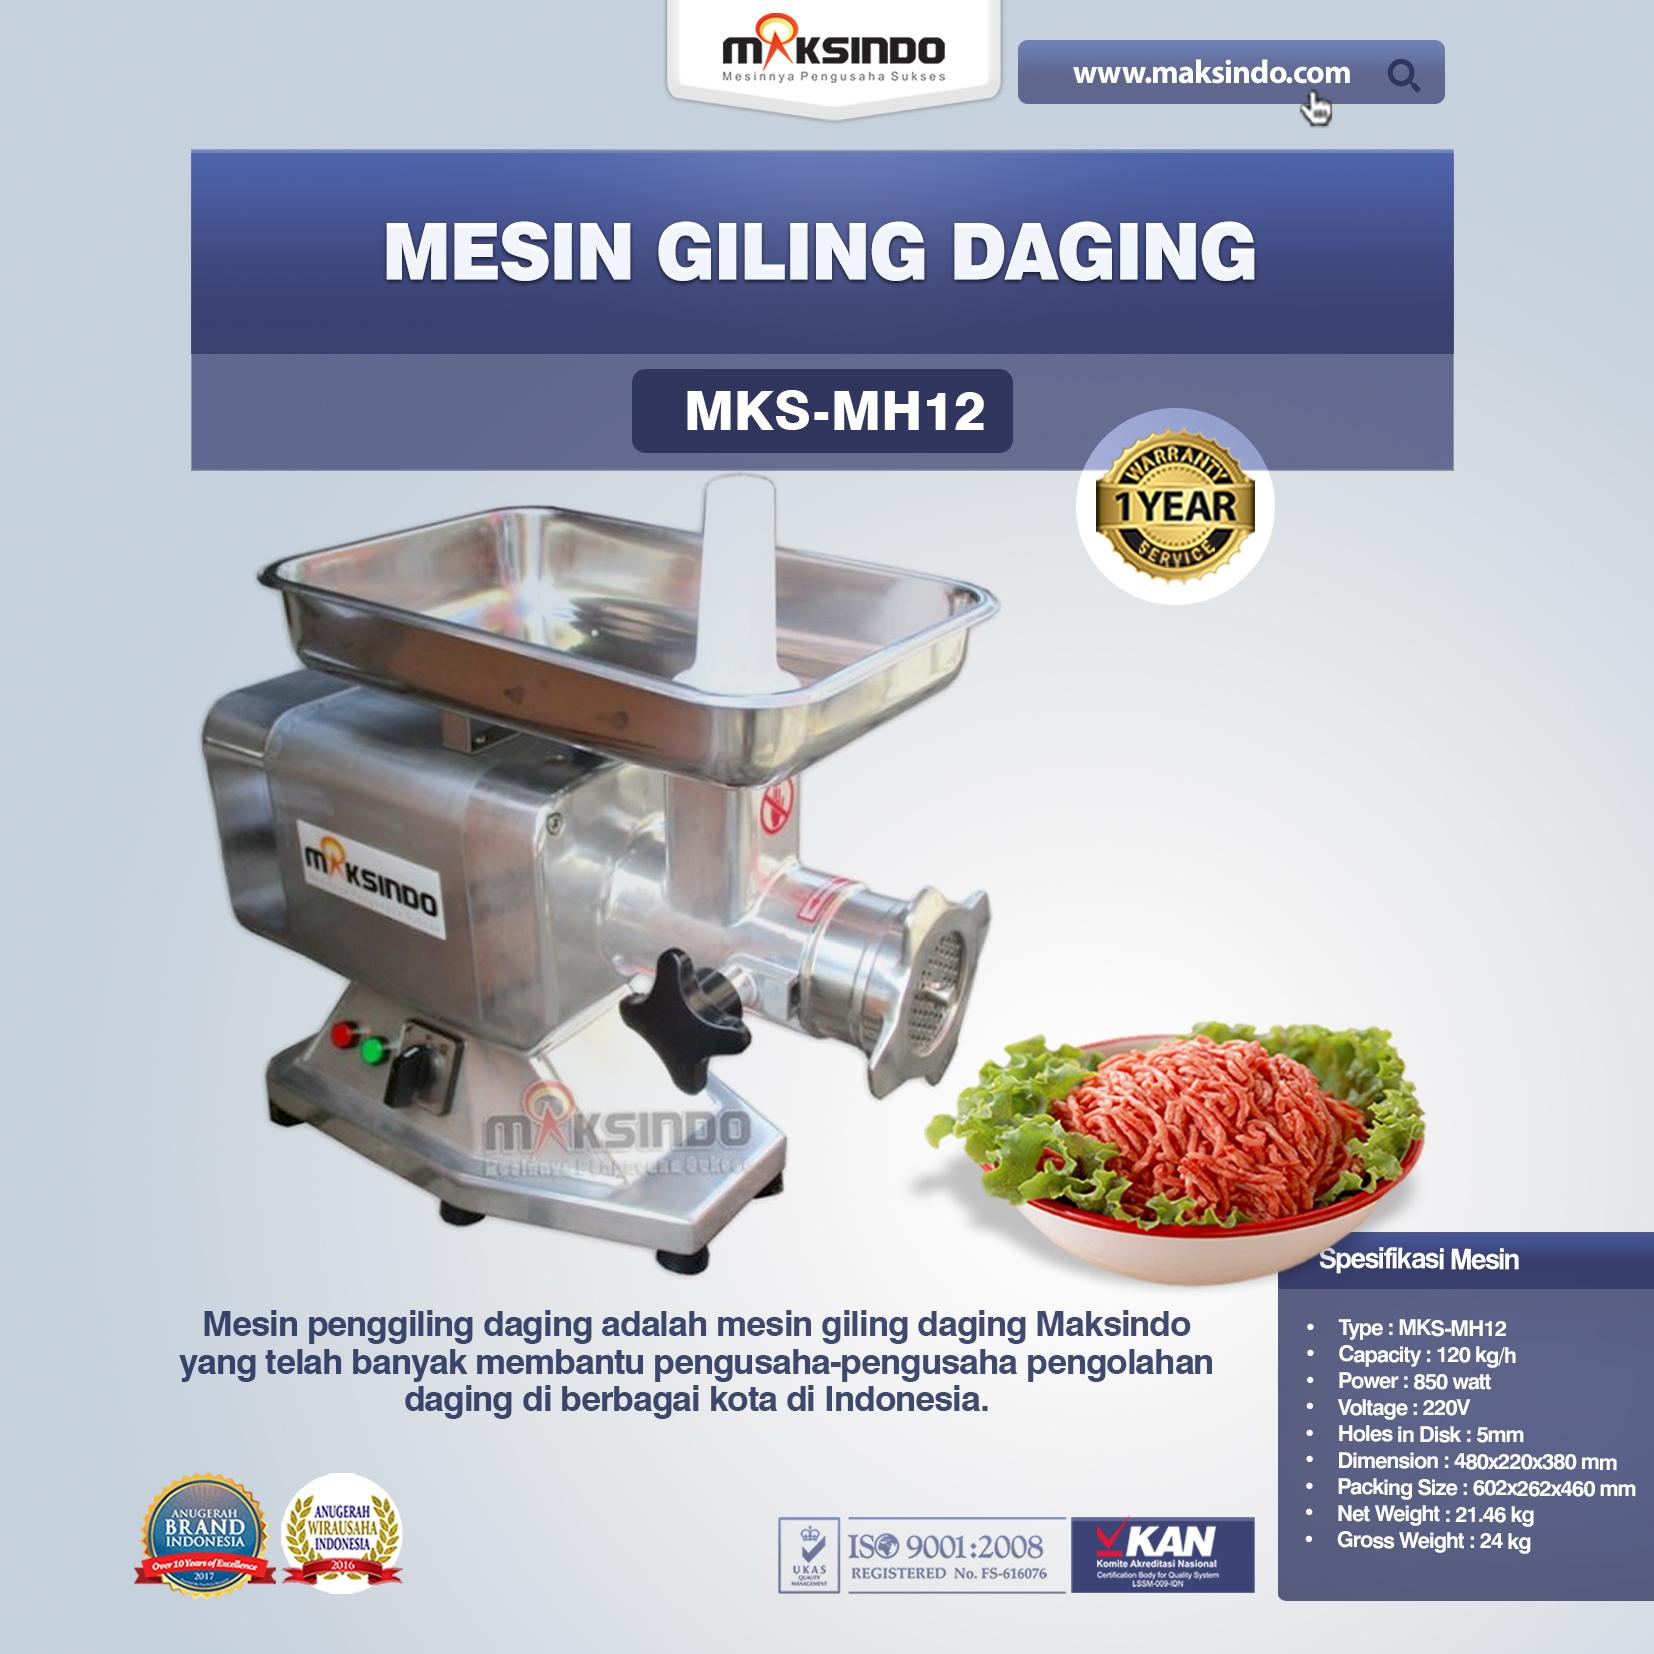 Mesin Giling Daging MKS-MH12